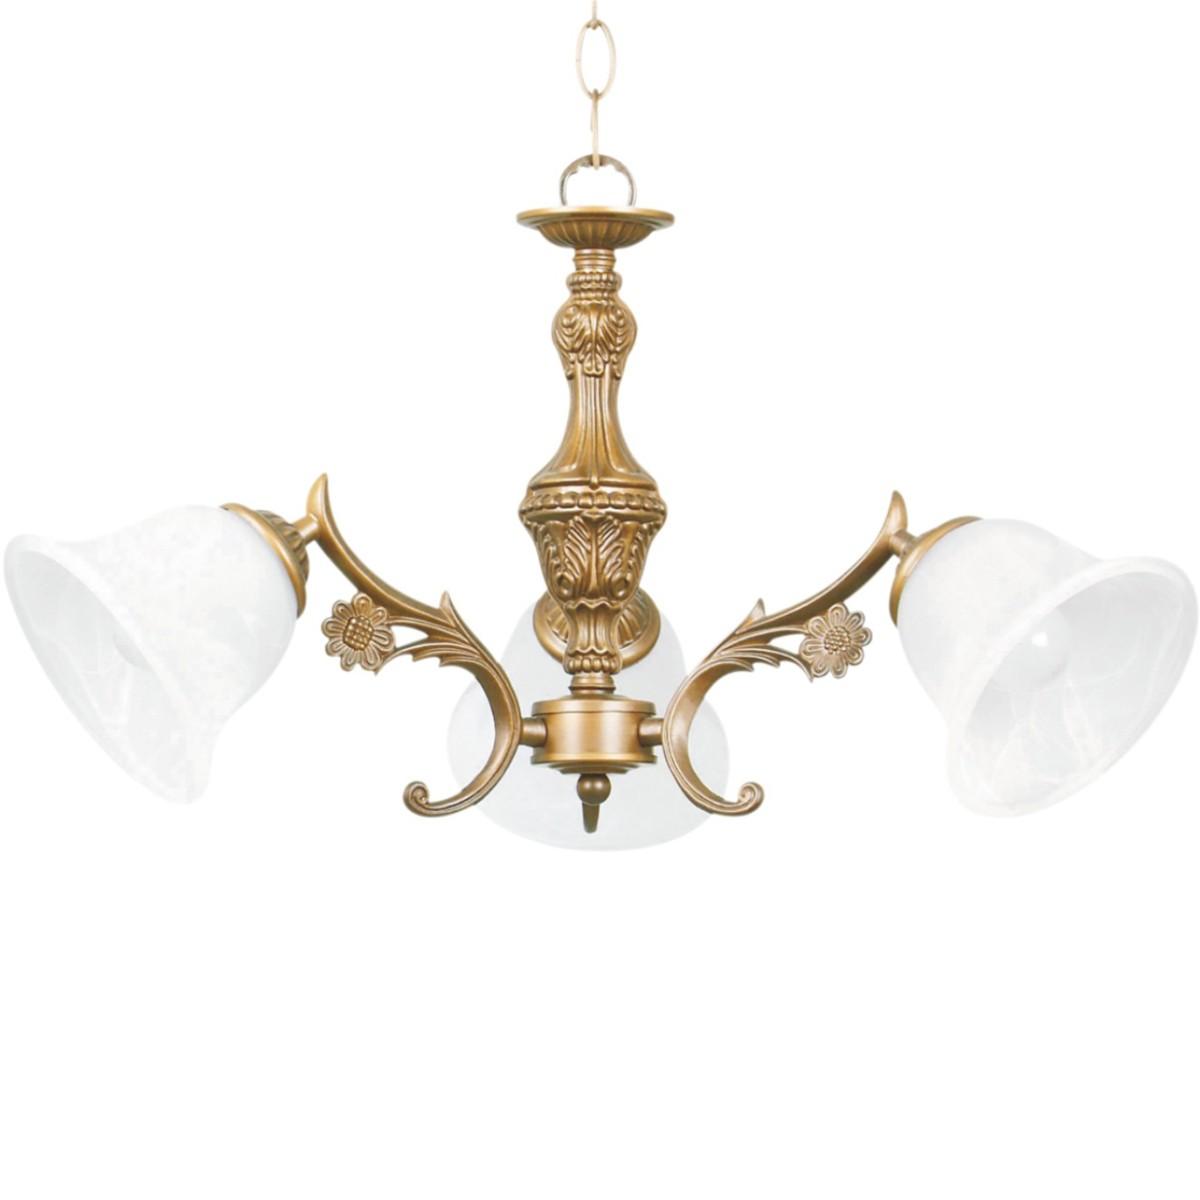 dedeman tatra 3 candelabru kl 2673 dedicat planurilor tale. Black Bedroom Furniture Sets. Home Design Ideas